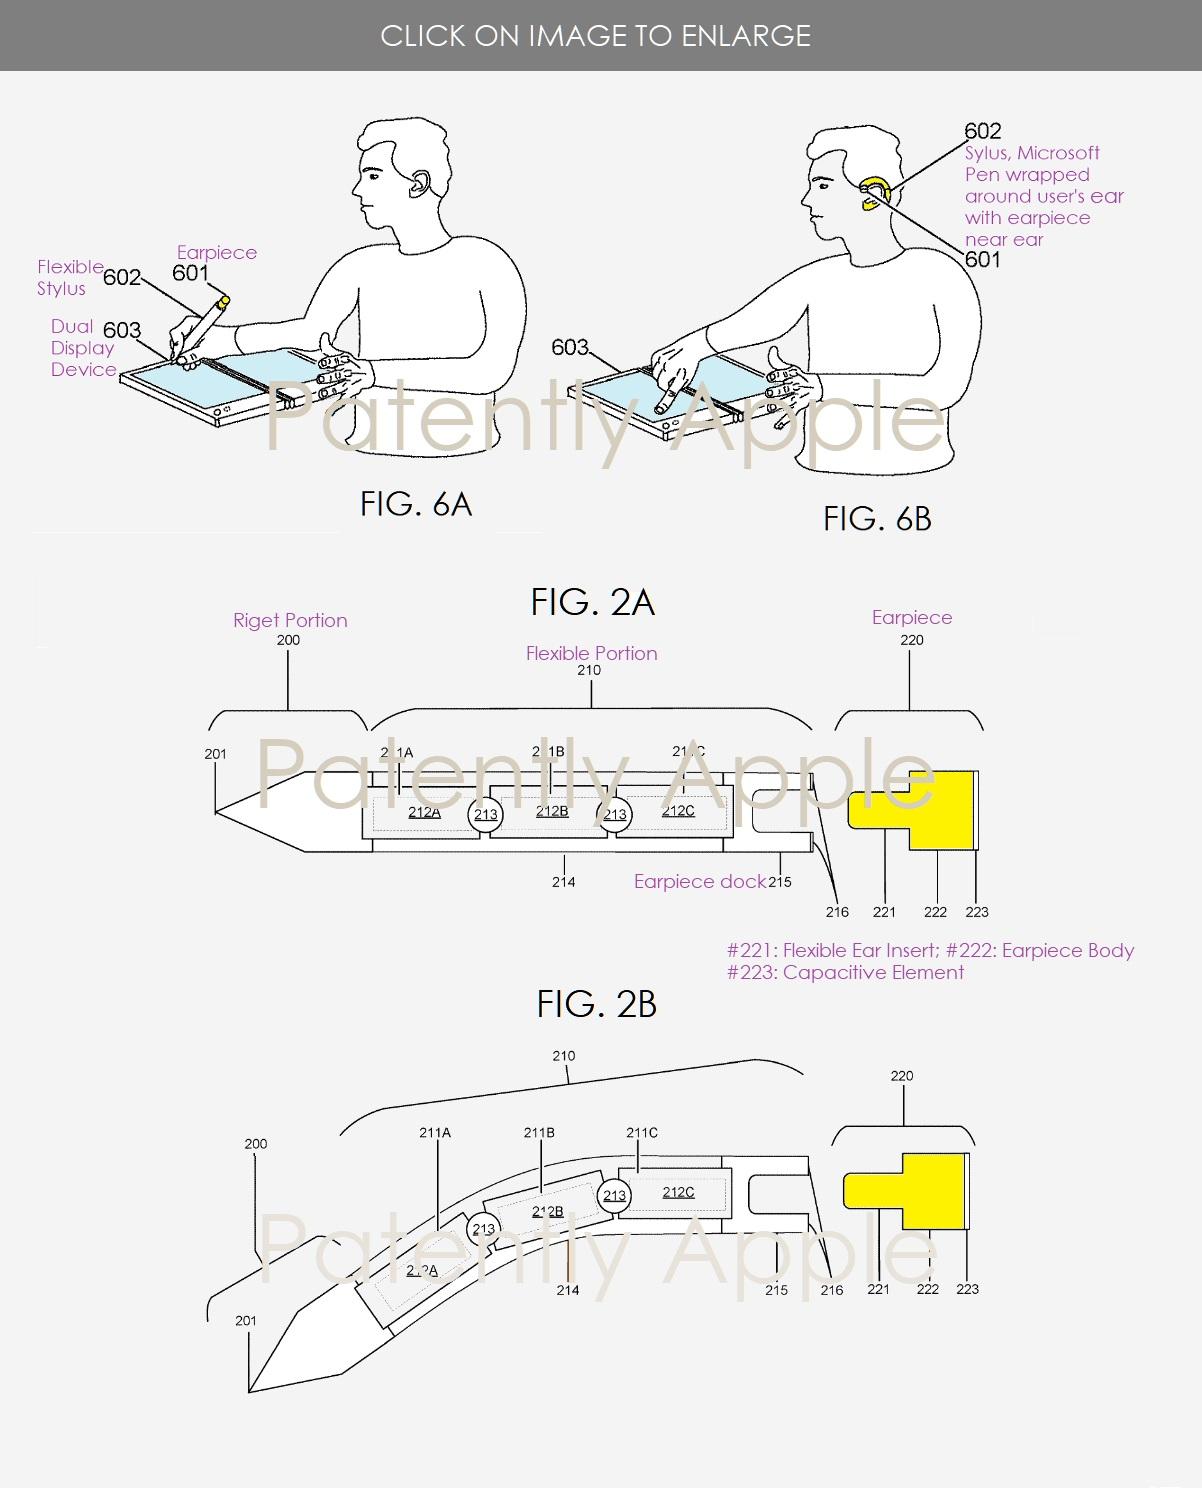 U S Patent Office Reveals Microsoft S Strange New Airpods